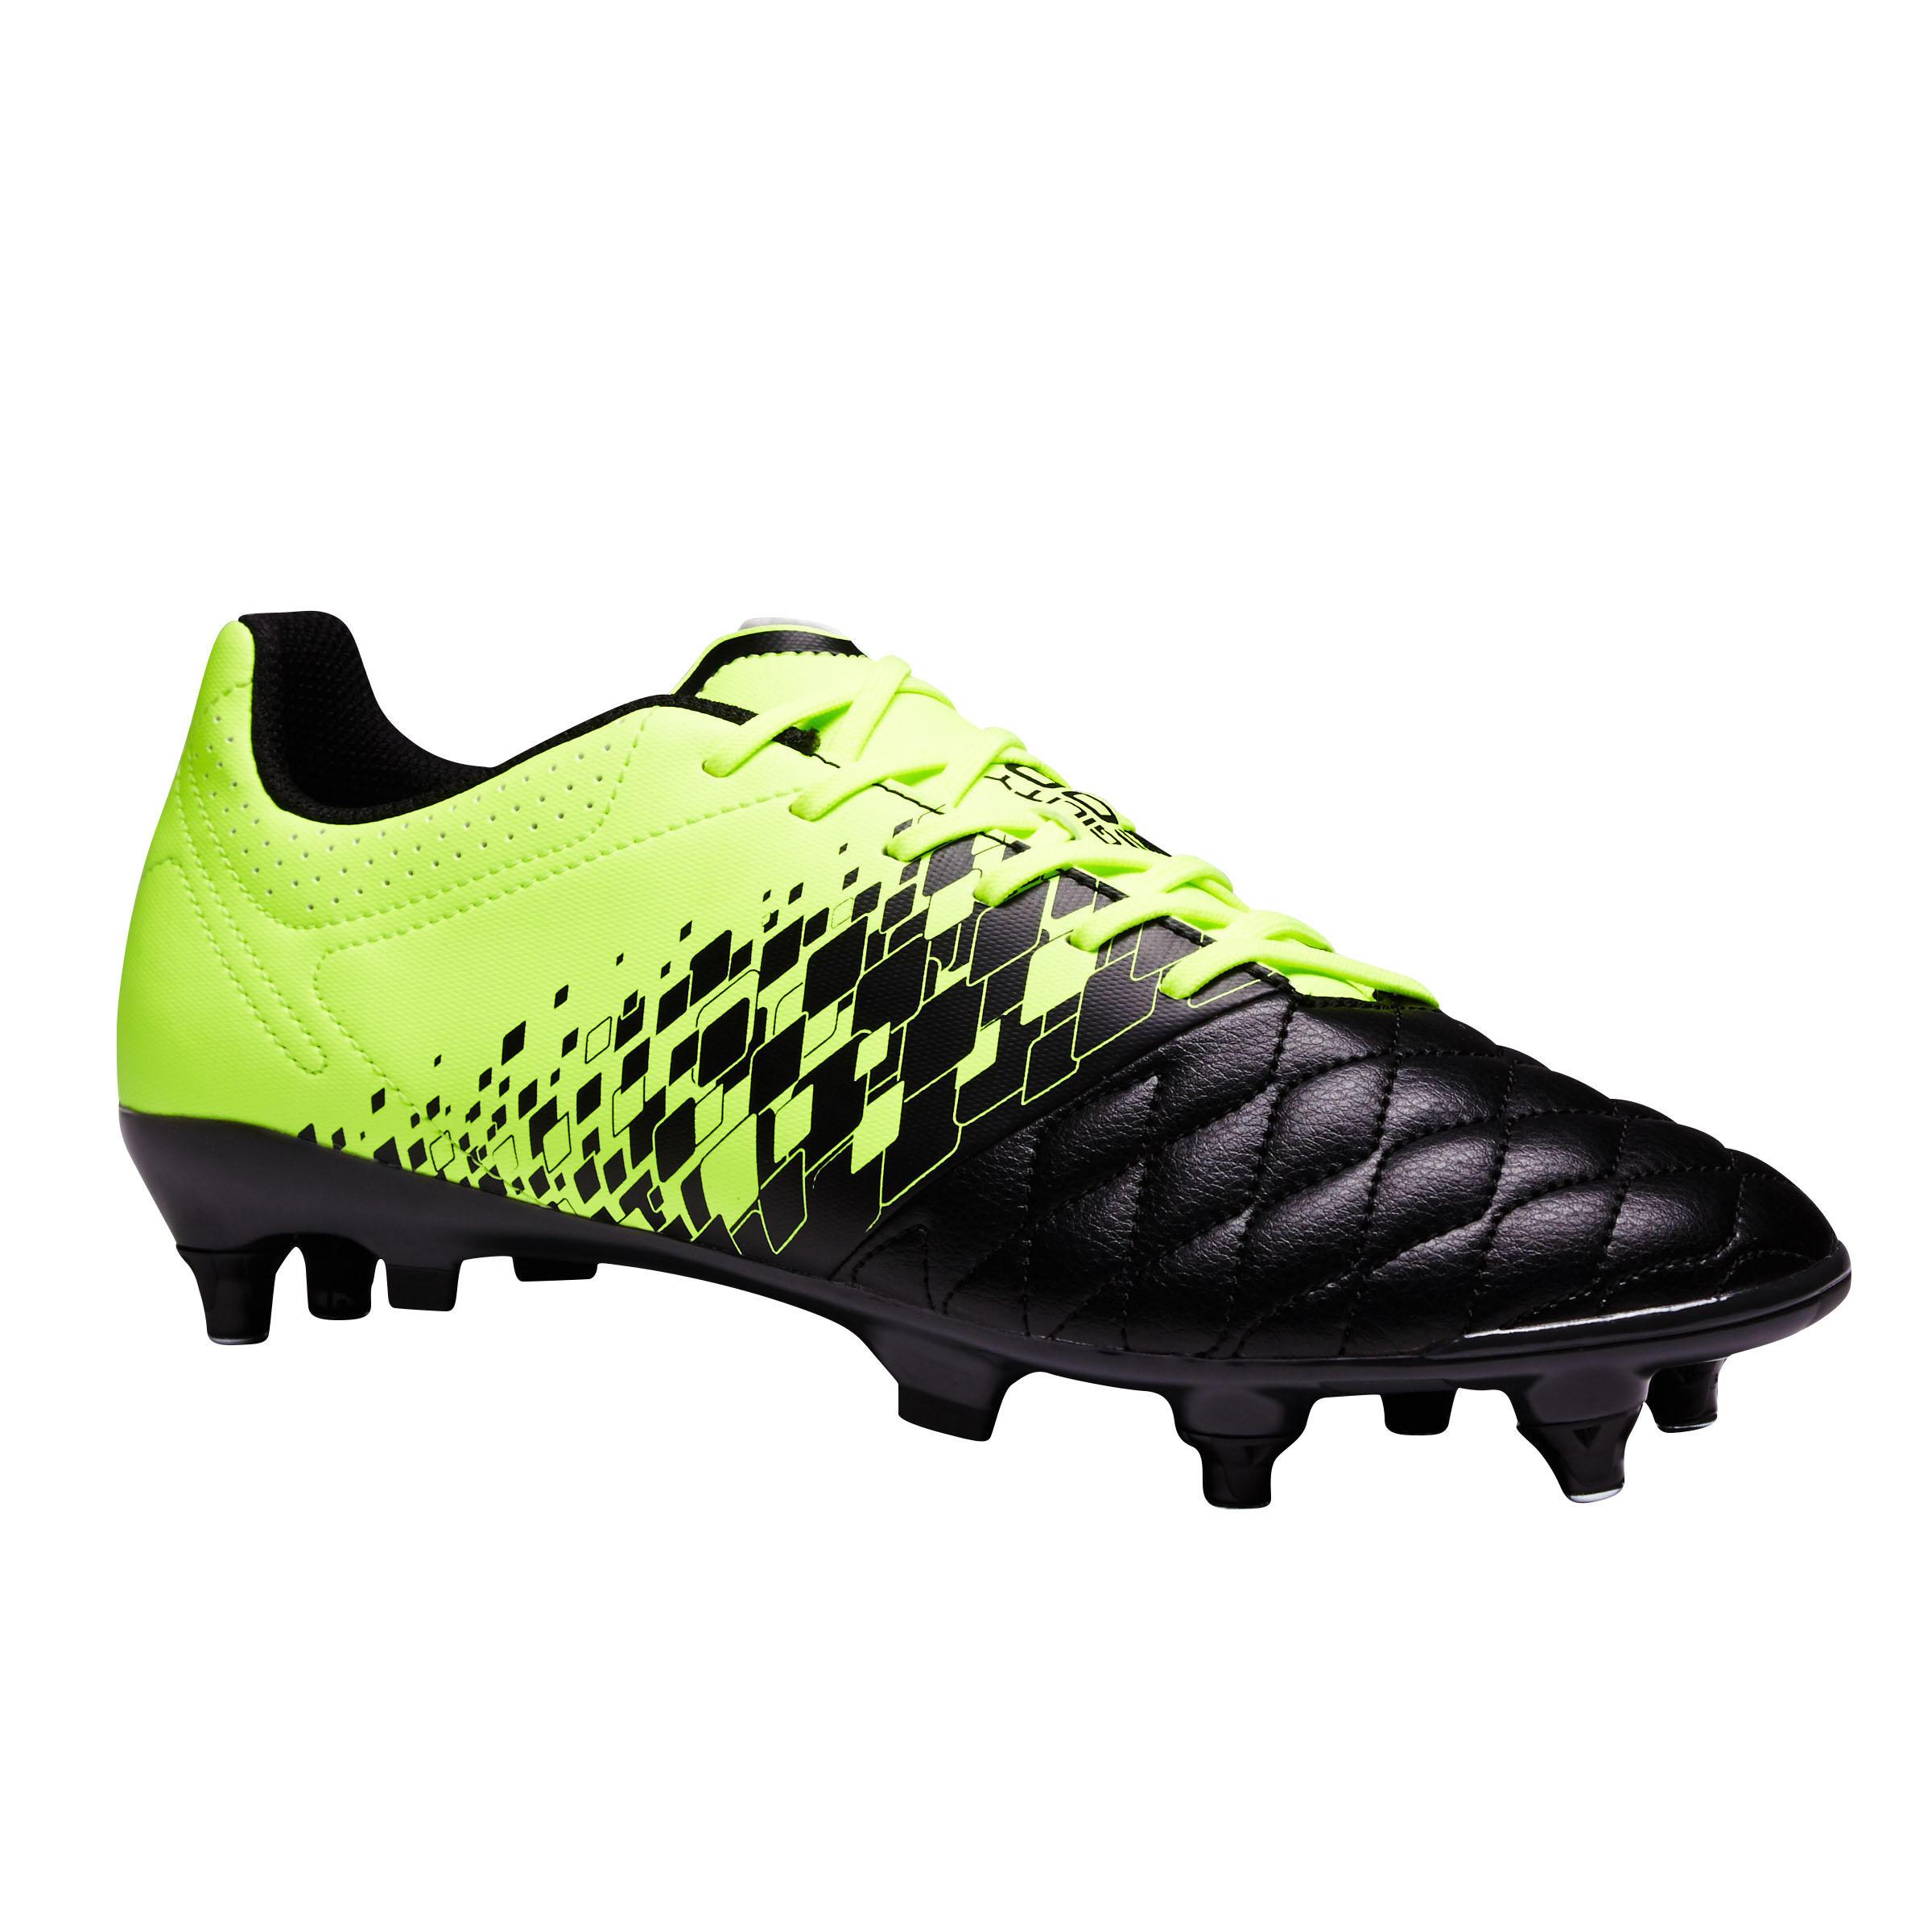 Football Boots \u0026 Shoes | Mens, Womens